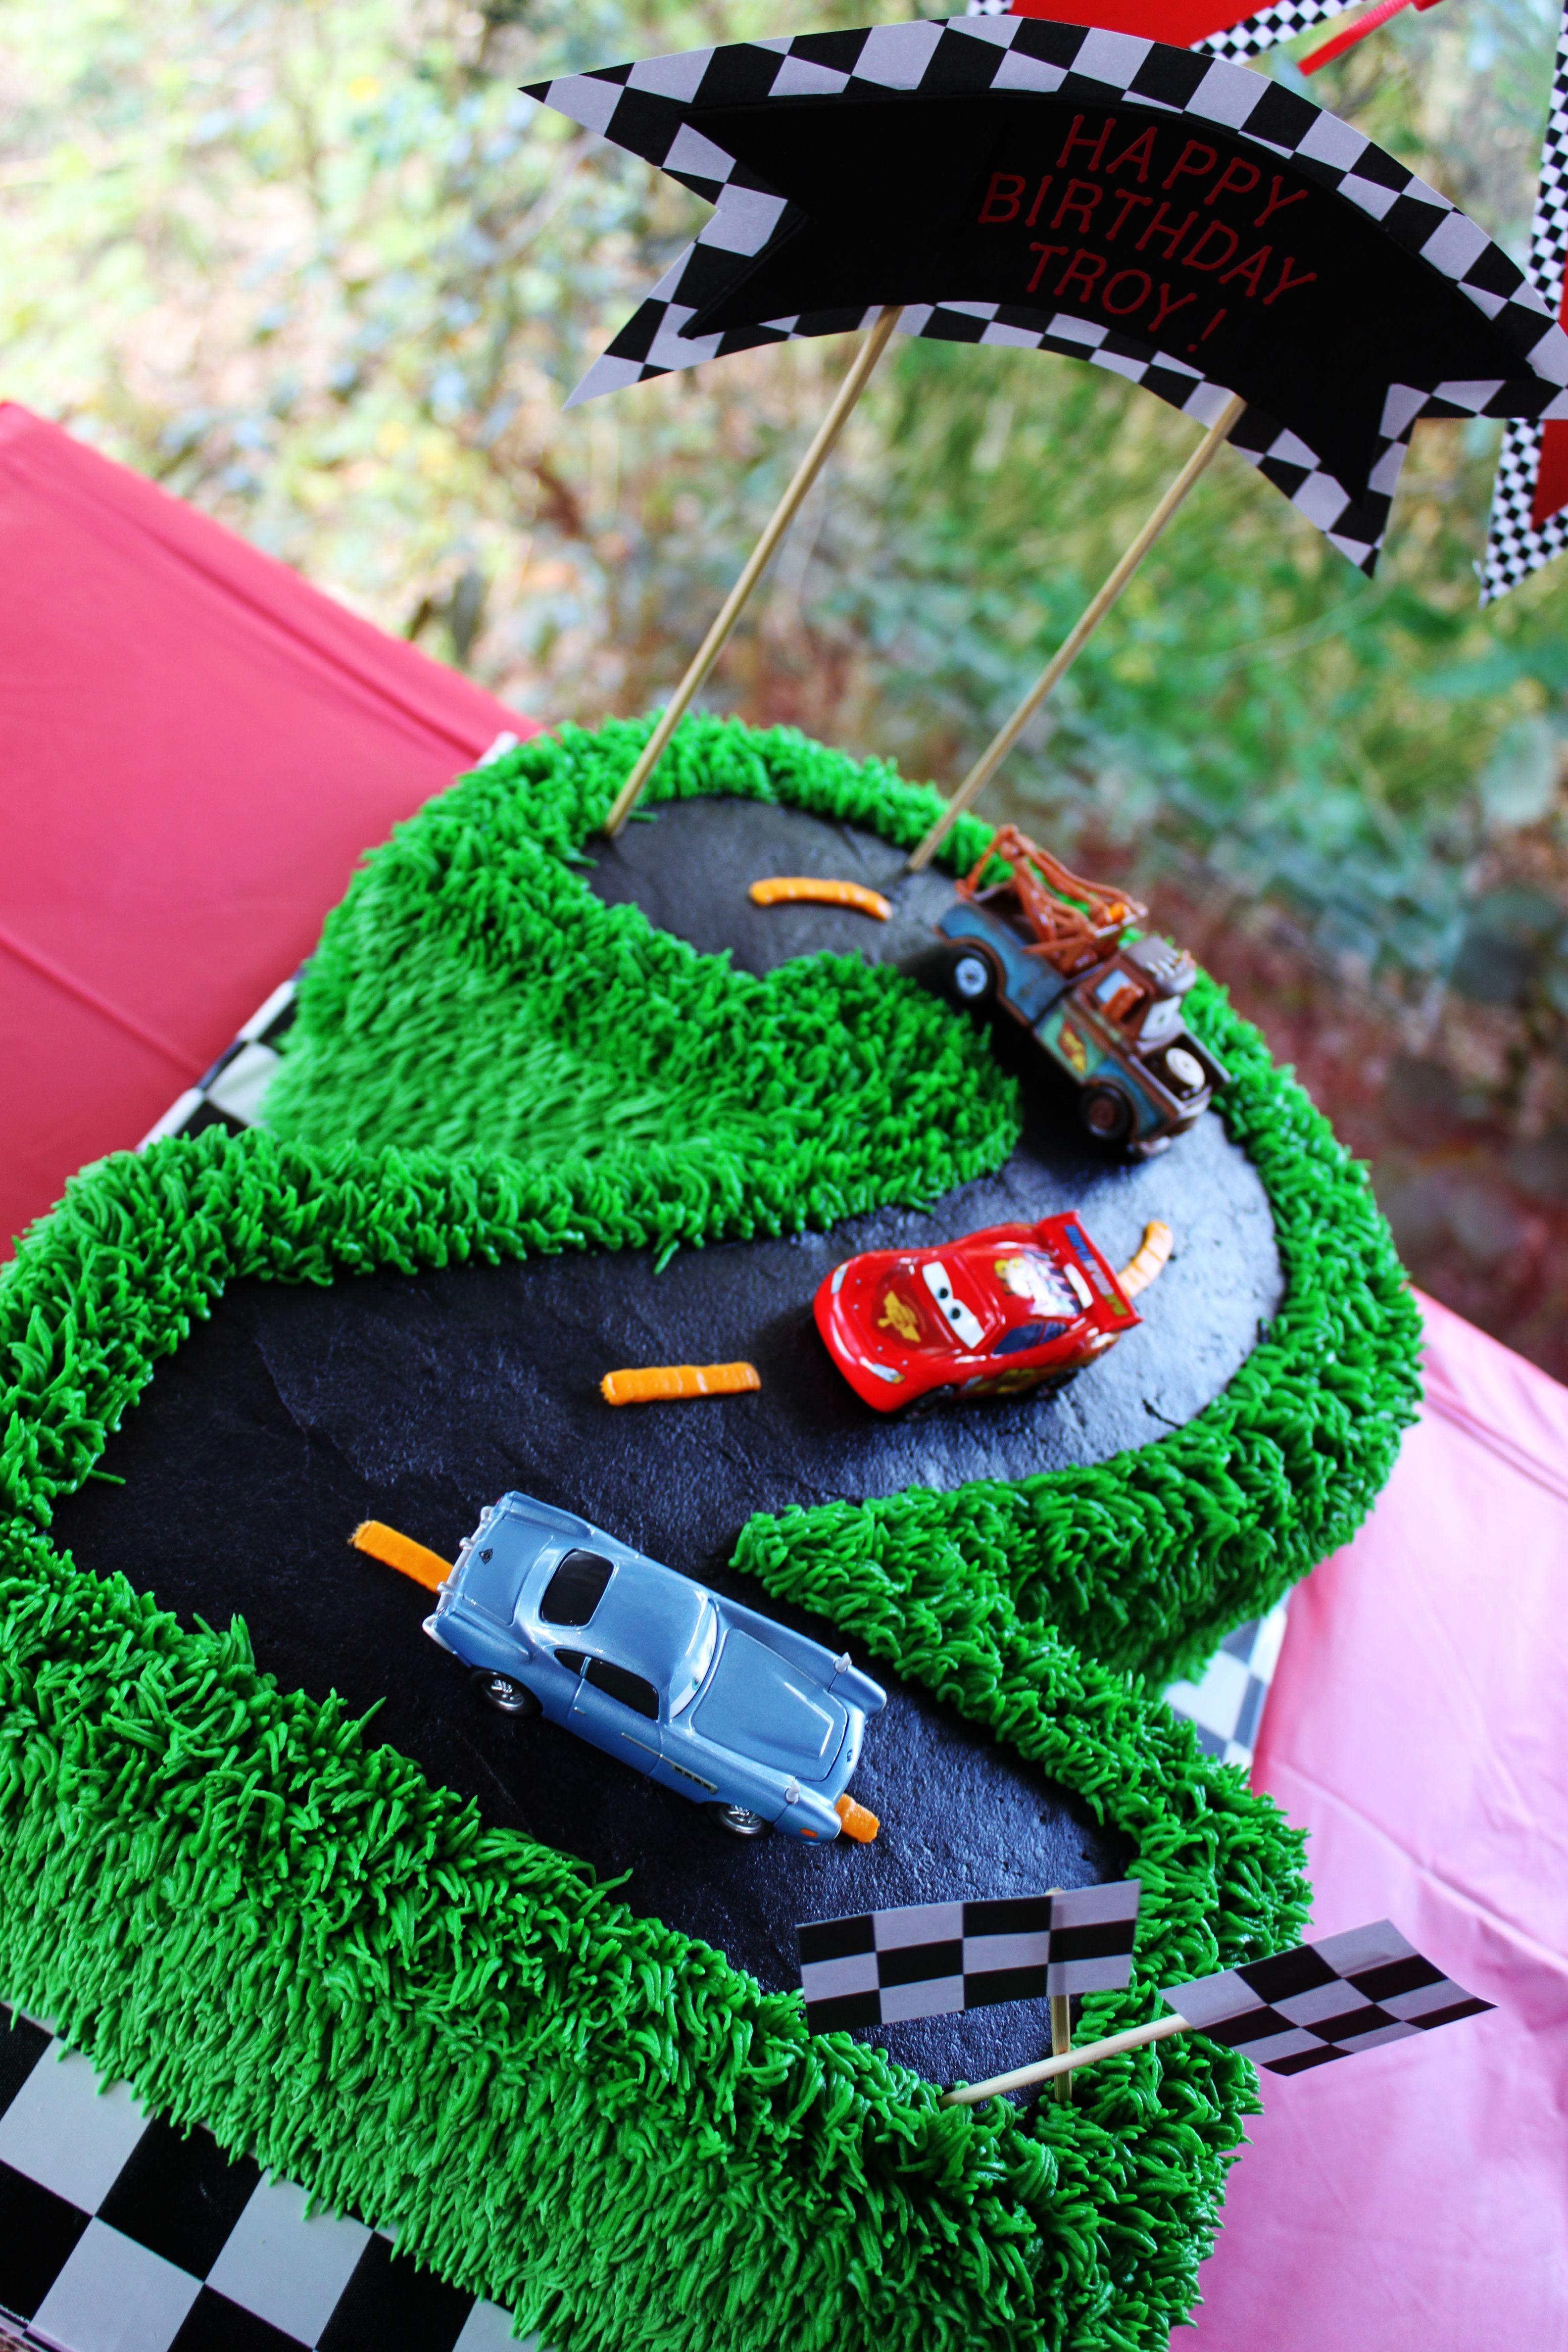 Best birthday cake ever peanut 39 s car theme birthday for How to make the best birthday cake ever